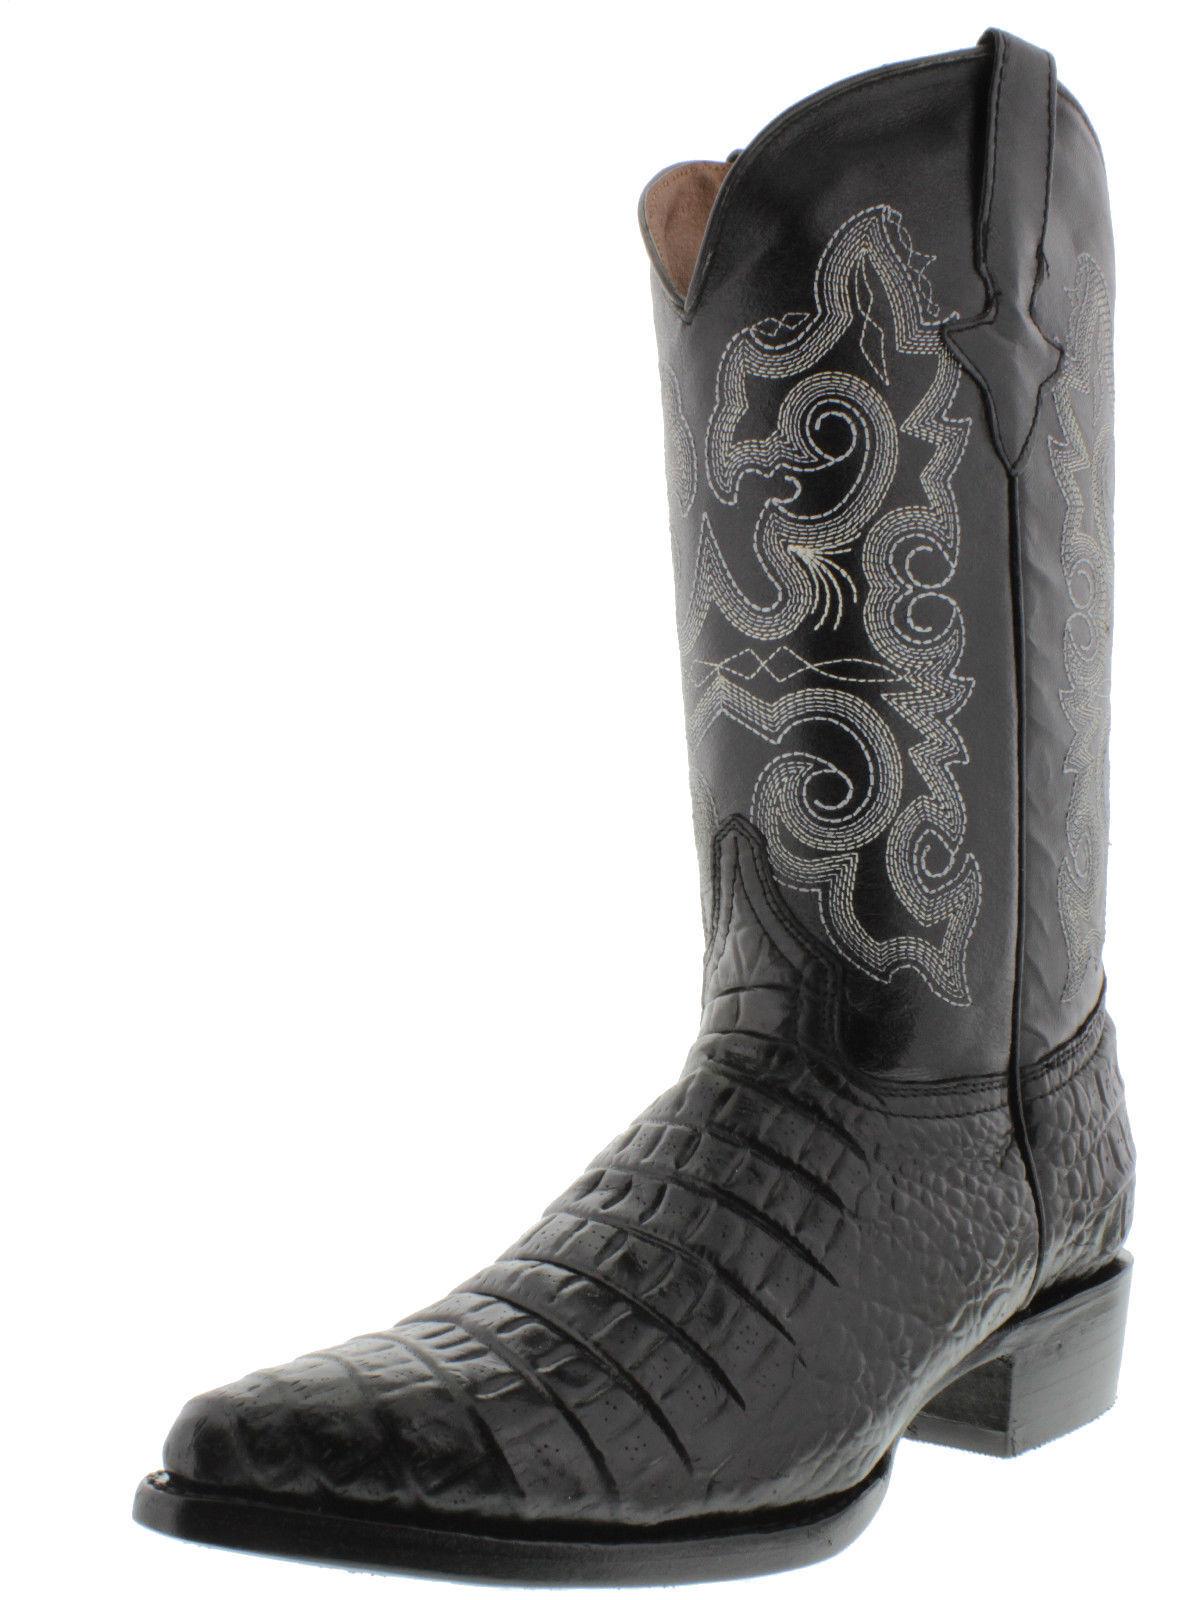 Men's New Leather Crocodile Belly Design Rodeo Toe Western Cowboy Boots J Toe Rodeo Black 6e82de